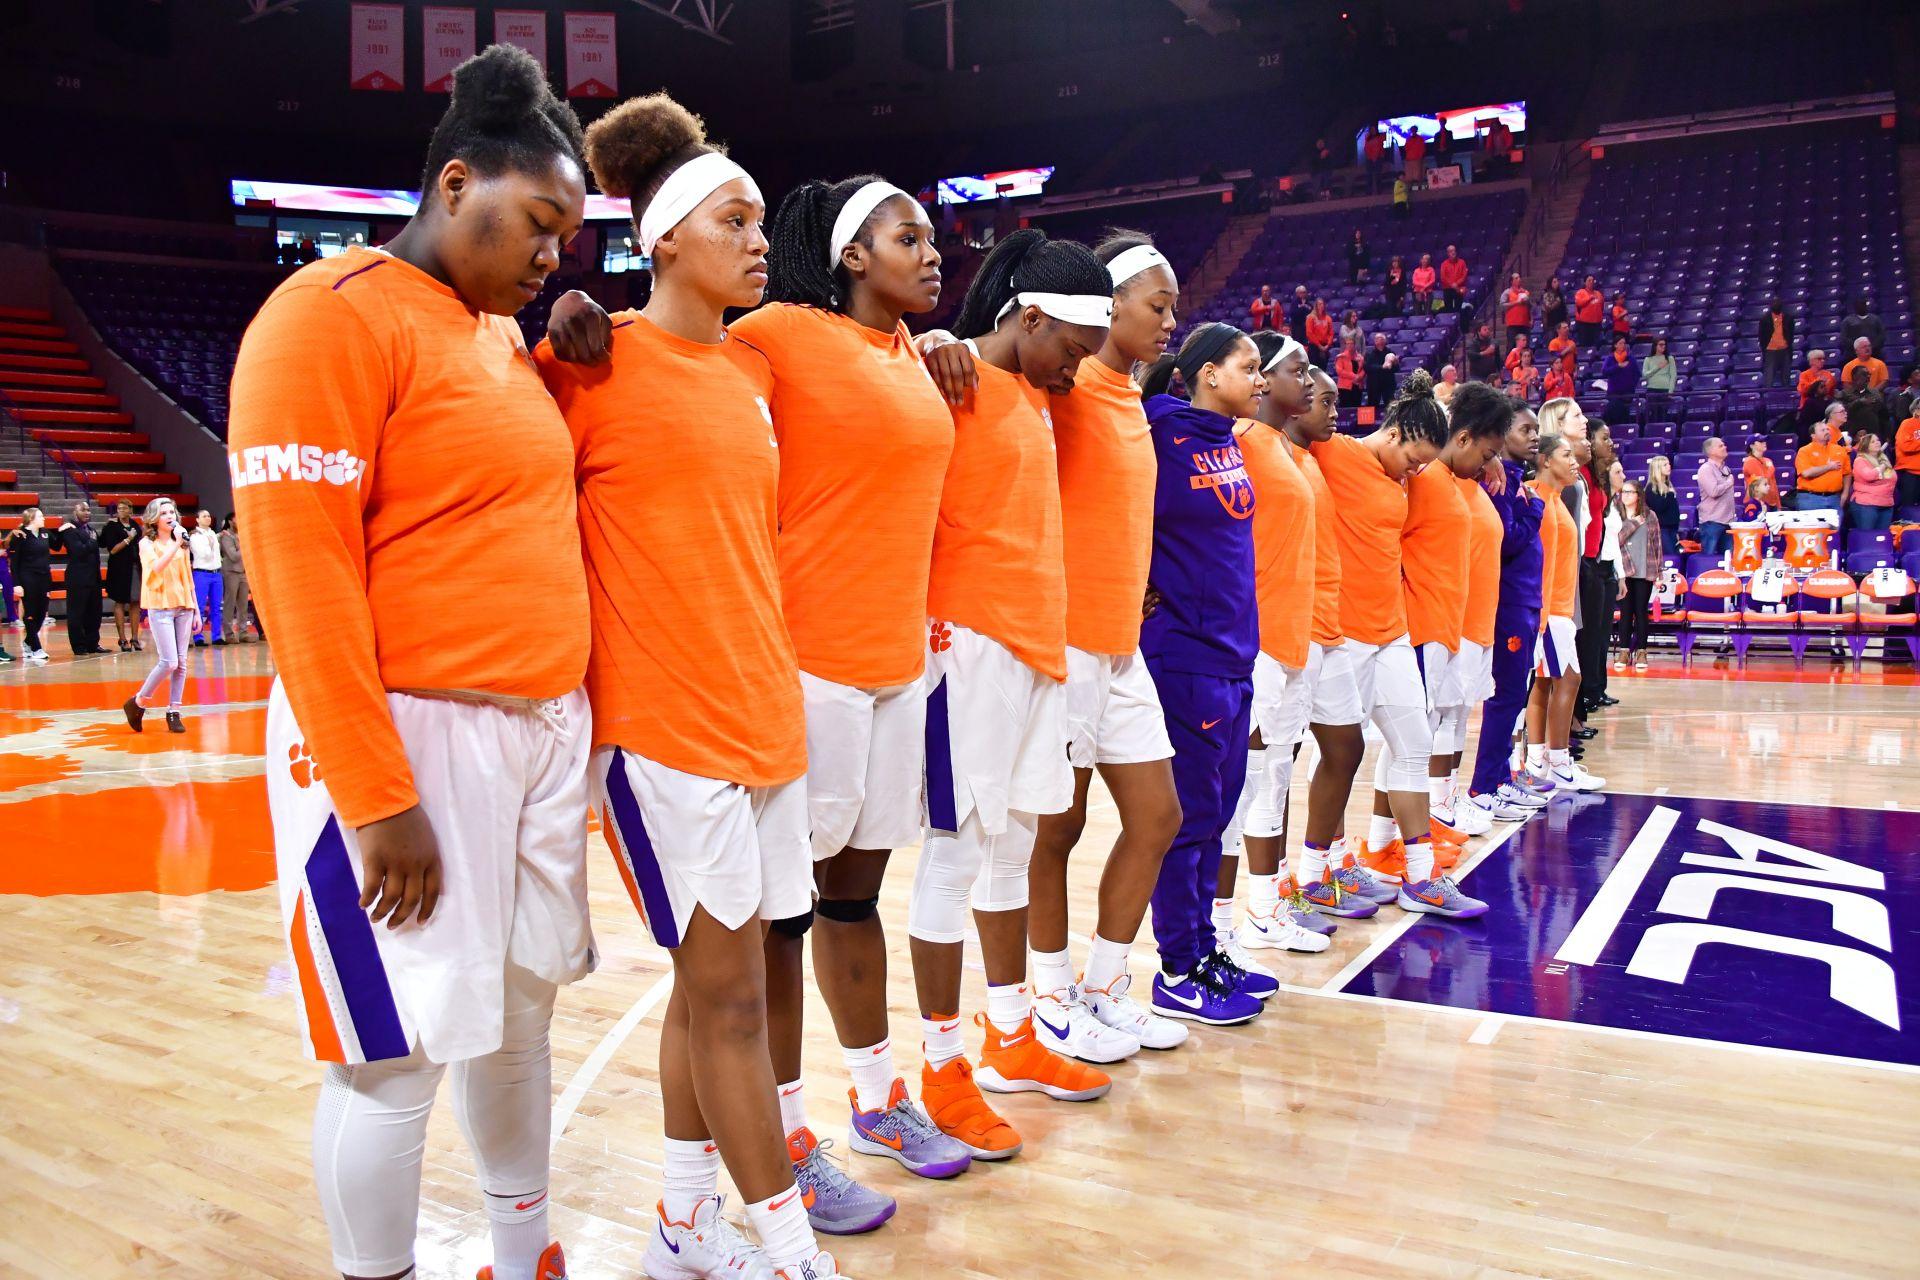 Clemson To Change Leadership of Women's Basketball